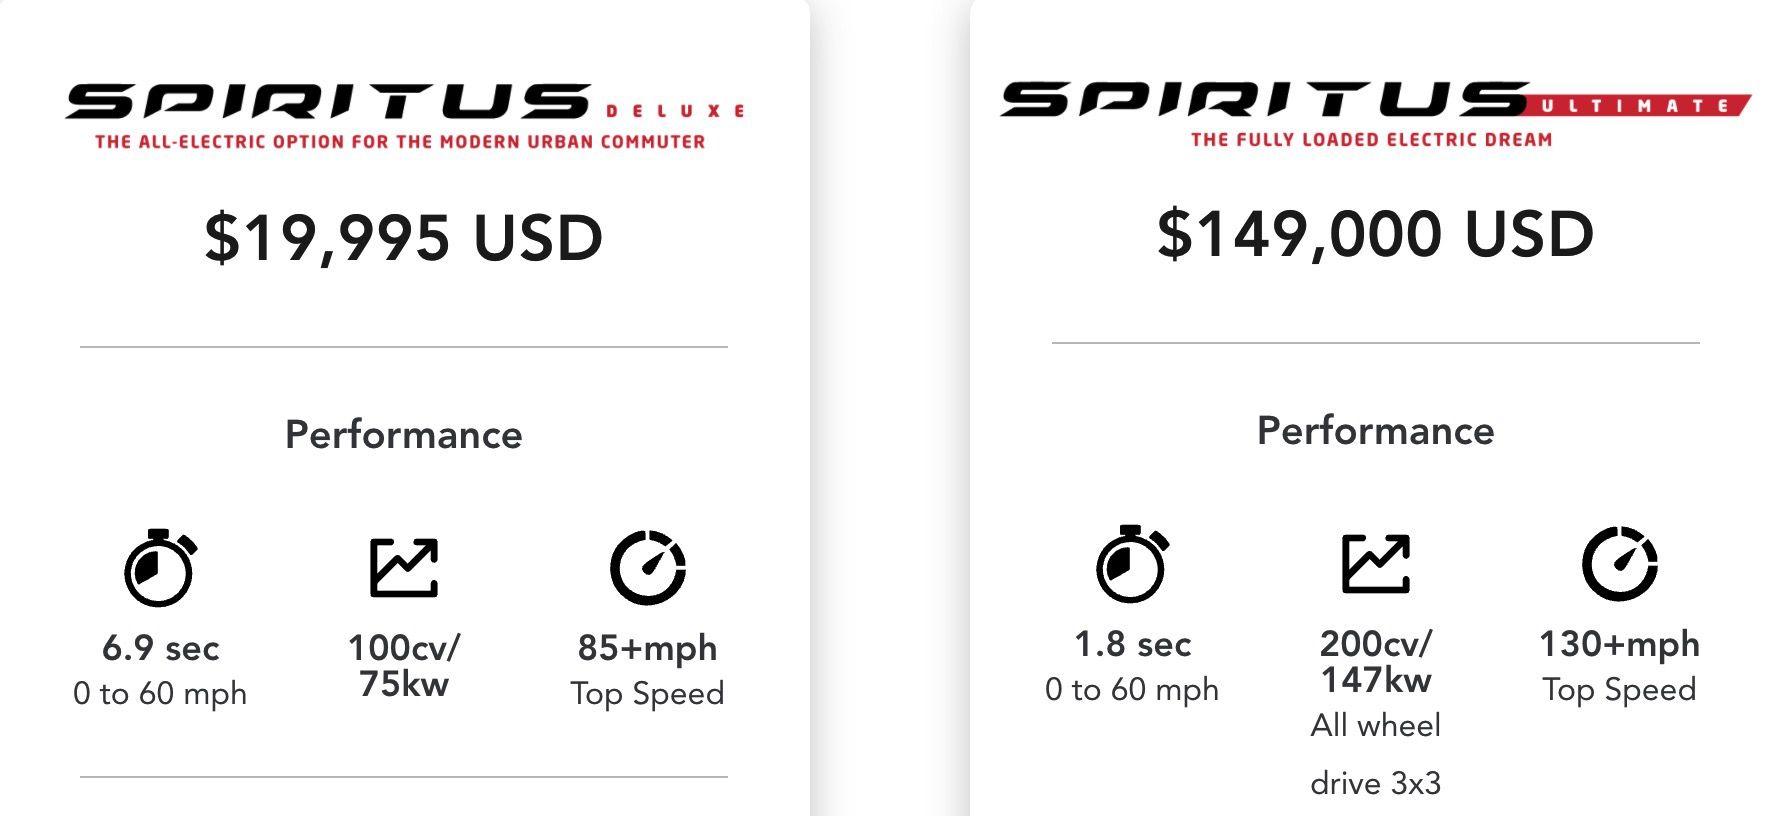 Spiritus pricing